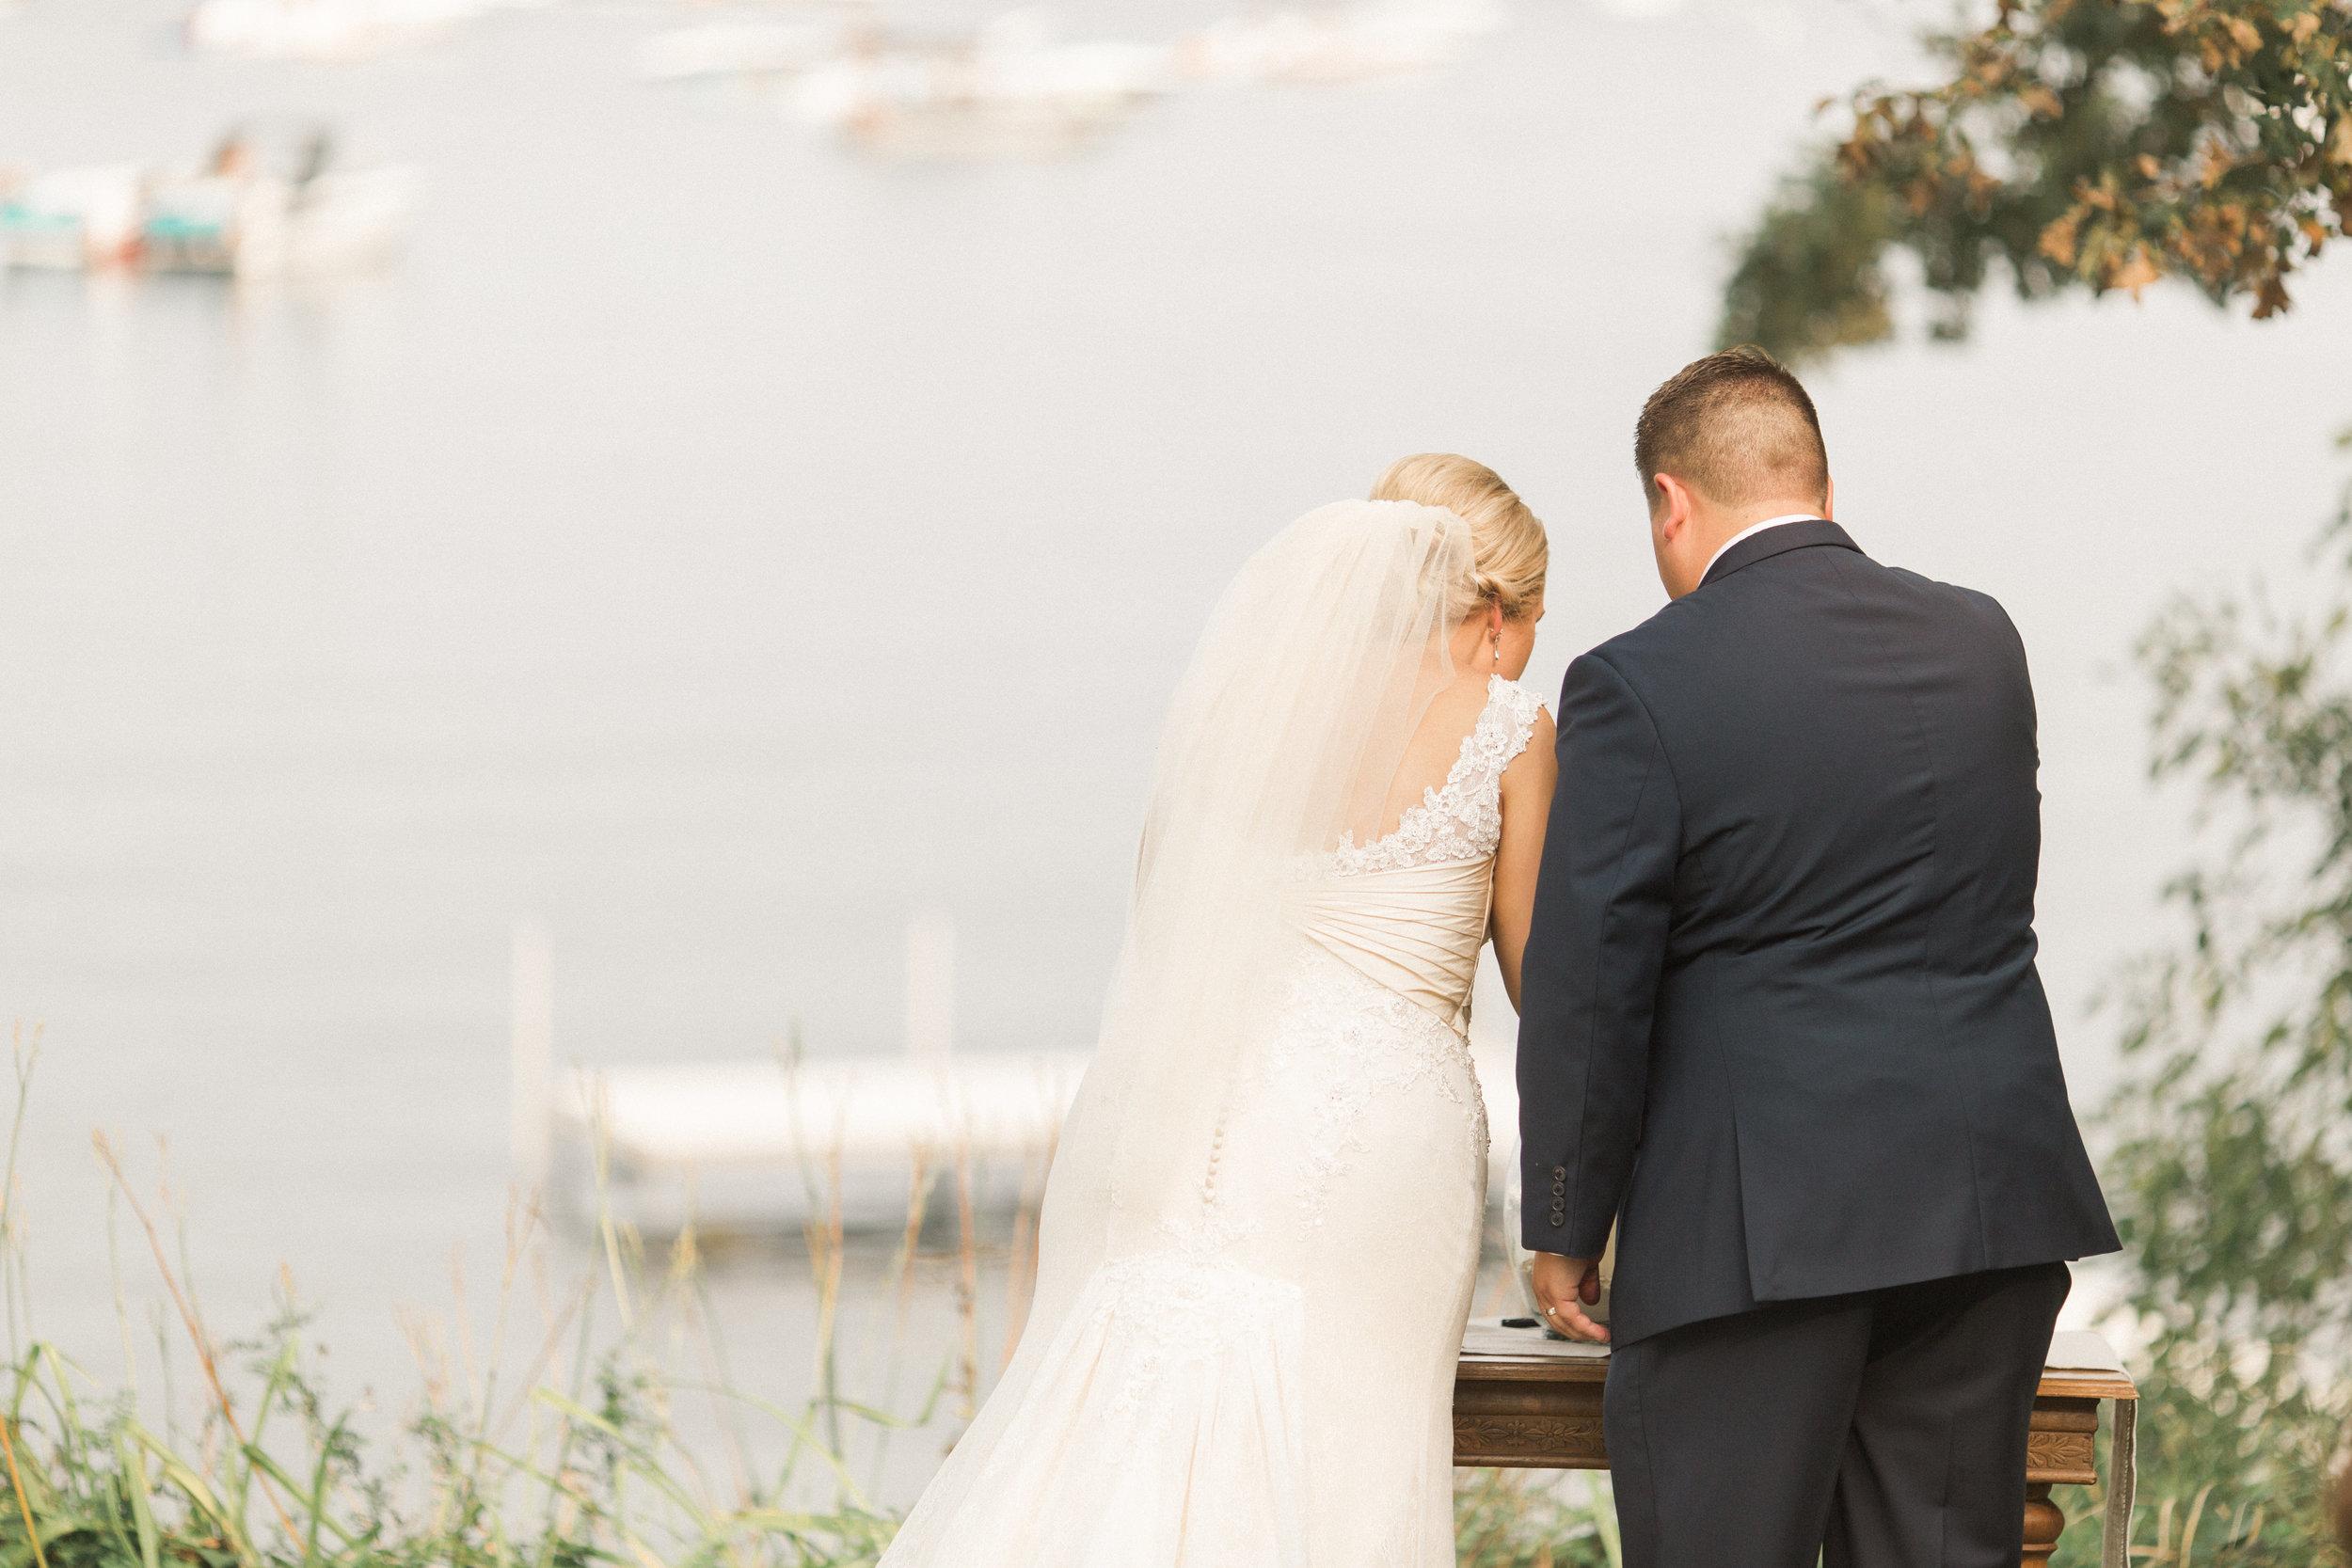 iowa-wedding-ceremony-outdoor-unity-ceremony-with-a-lake-view